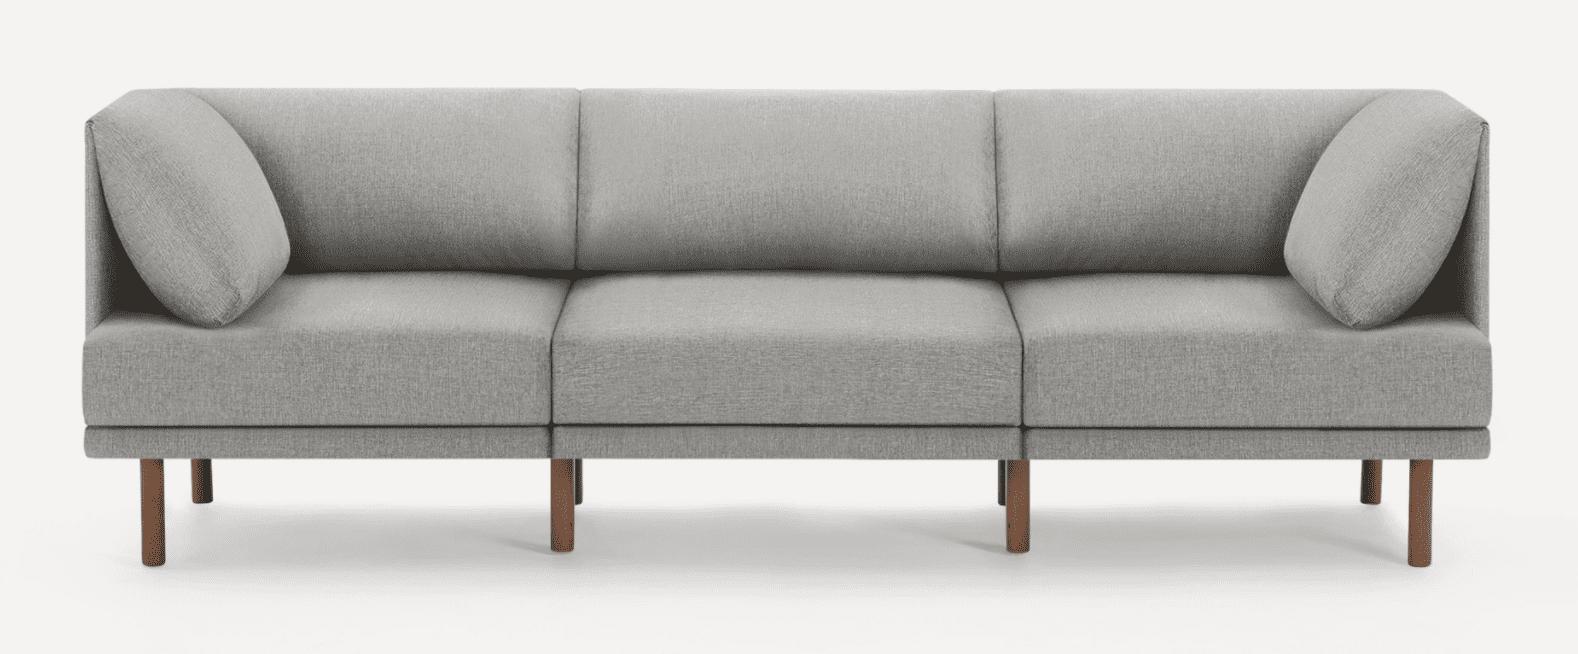 Burrow Range 3-Piece Sofa